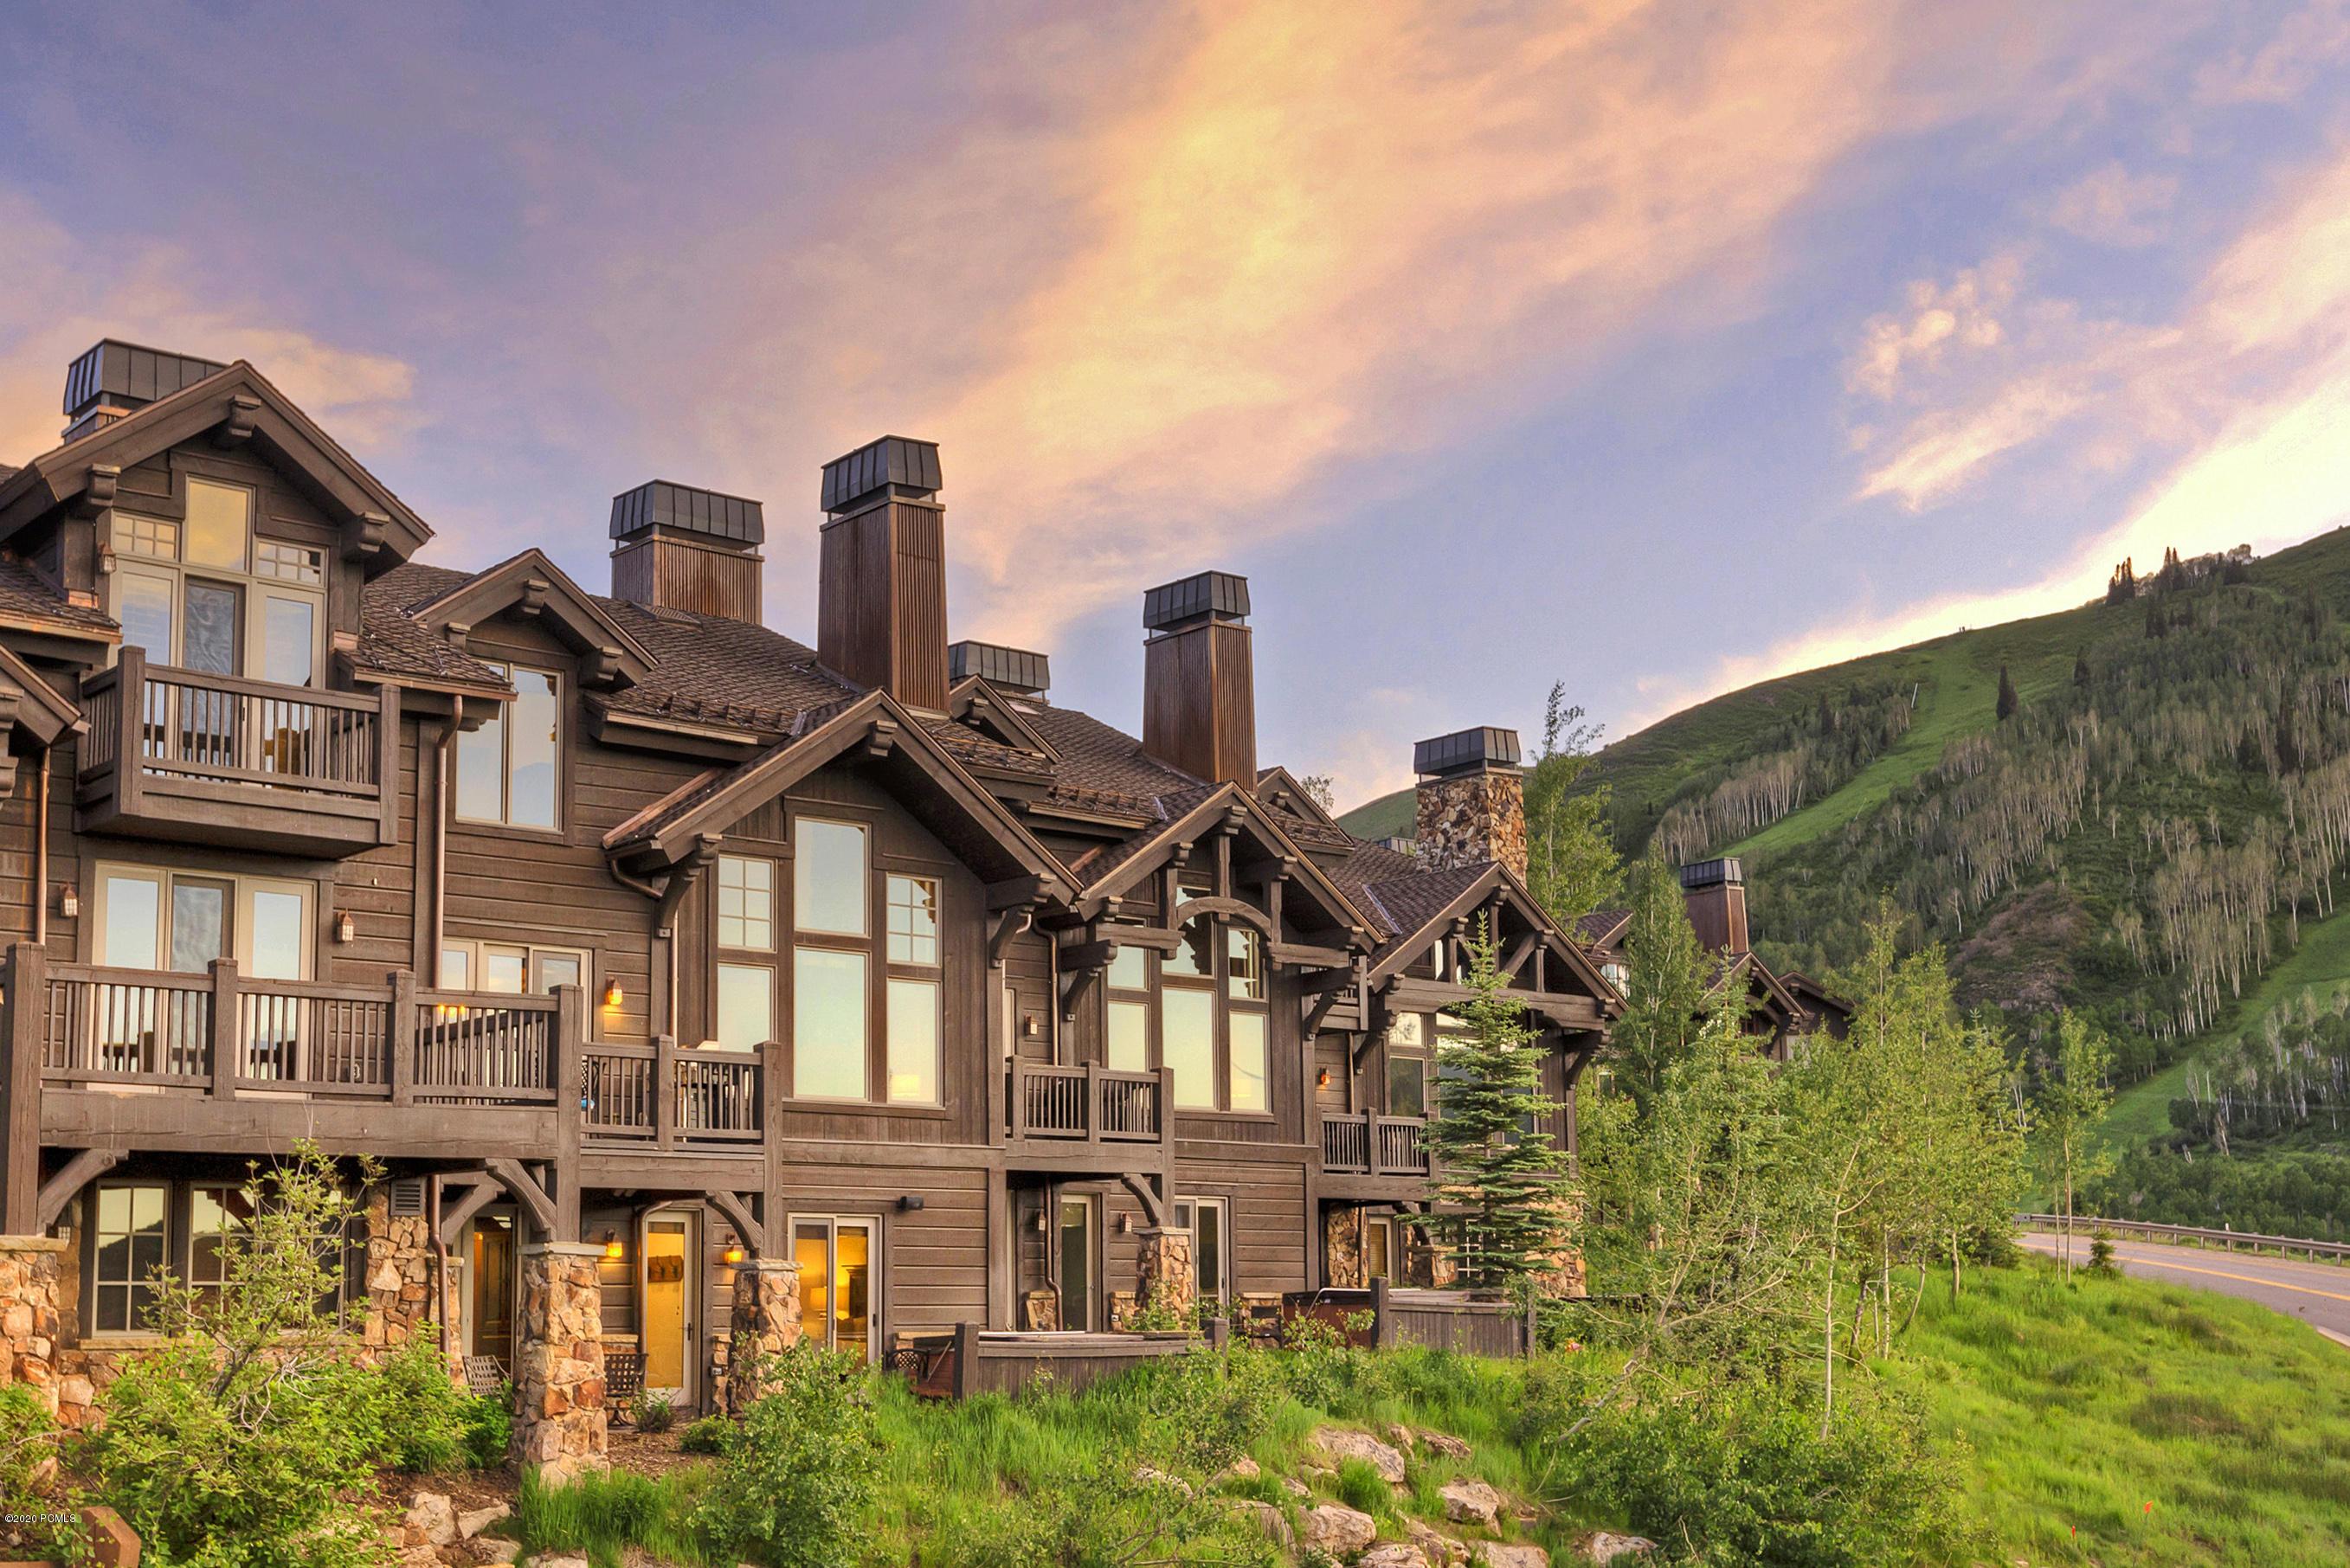 8789 Marsac Avenue, Park City, Utah 84060, 4 Bedrooms Bedrooms, ,6 BathroomsBathrooms,Condominium,For Sale,Marsac,20190109112430415765000000